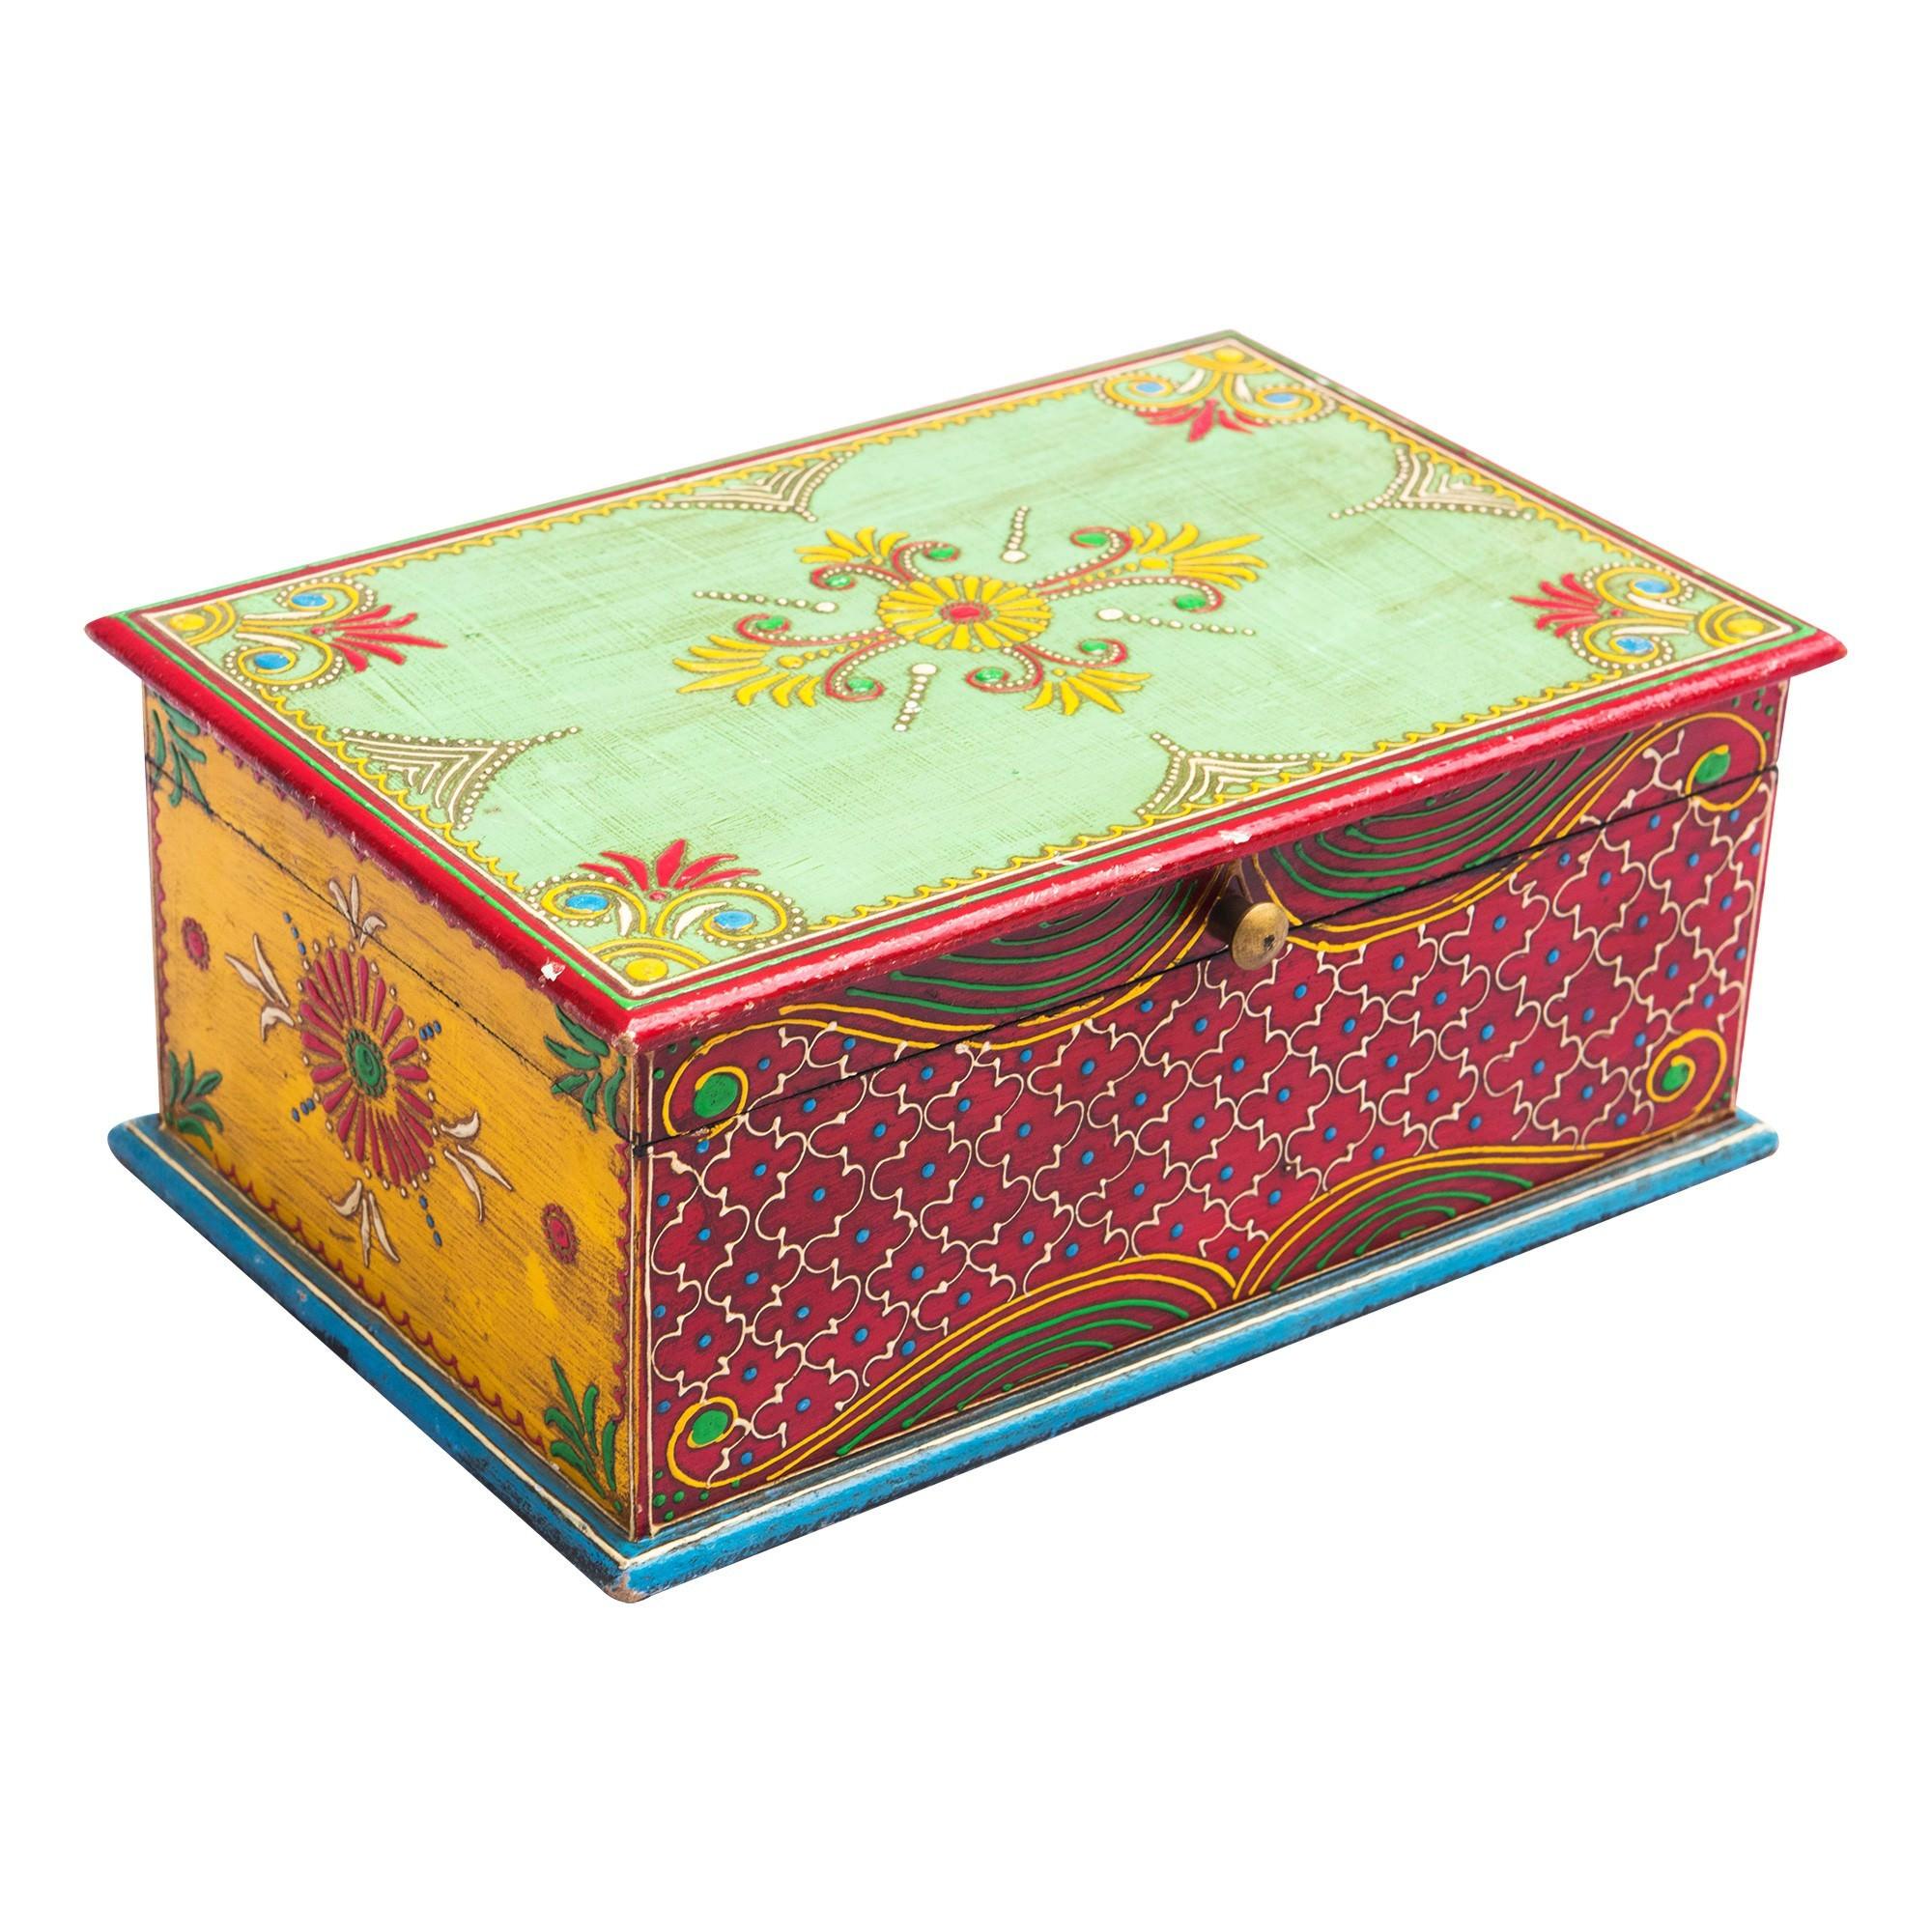 Nuga Painted Wooden Storage Box